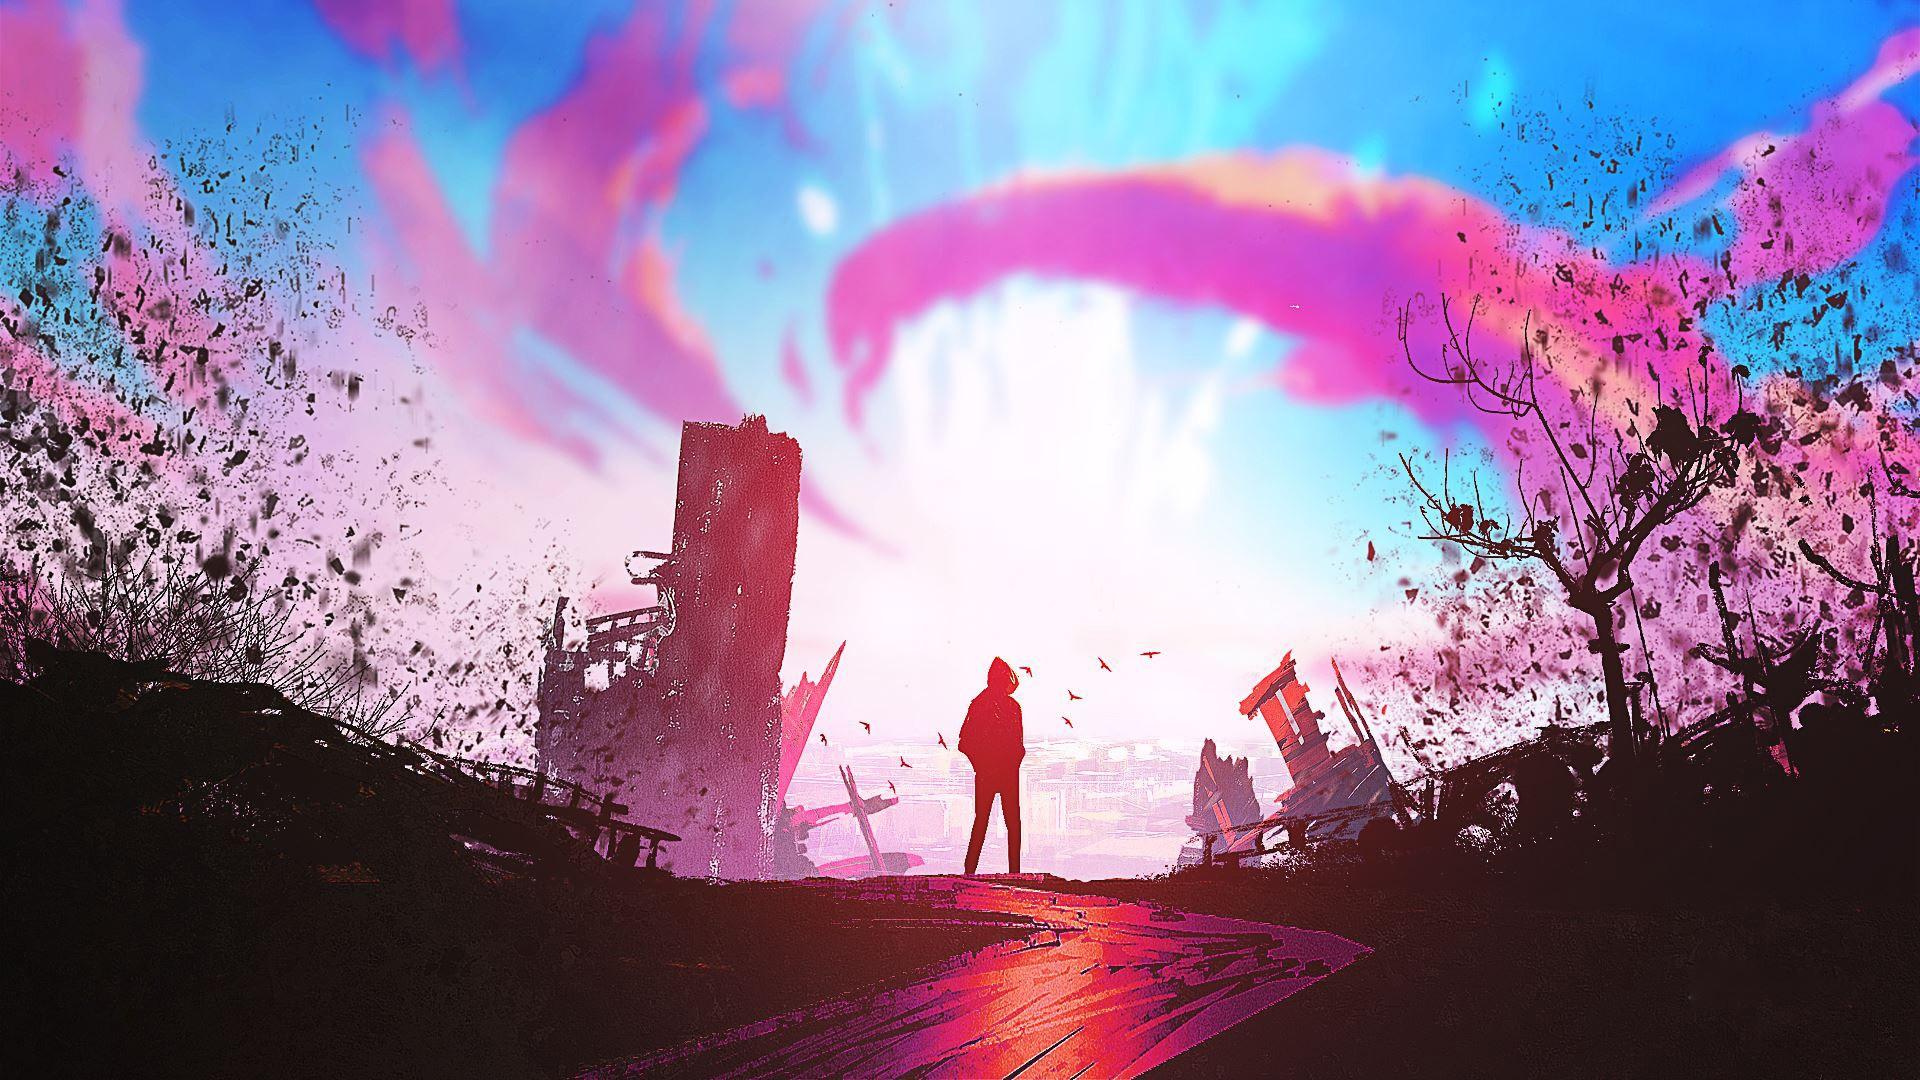 Free Download Illustration Fantasy Art Sunset Artwork Wallpaper